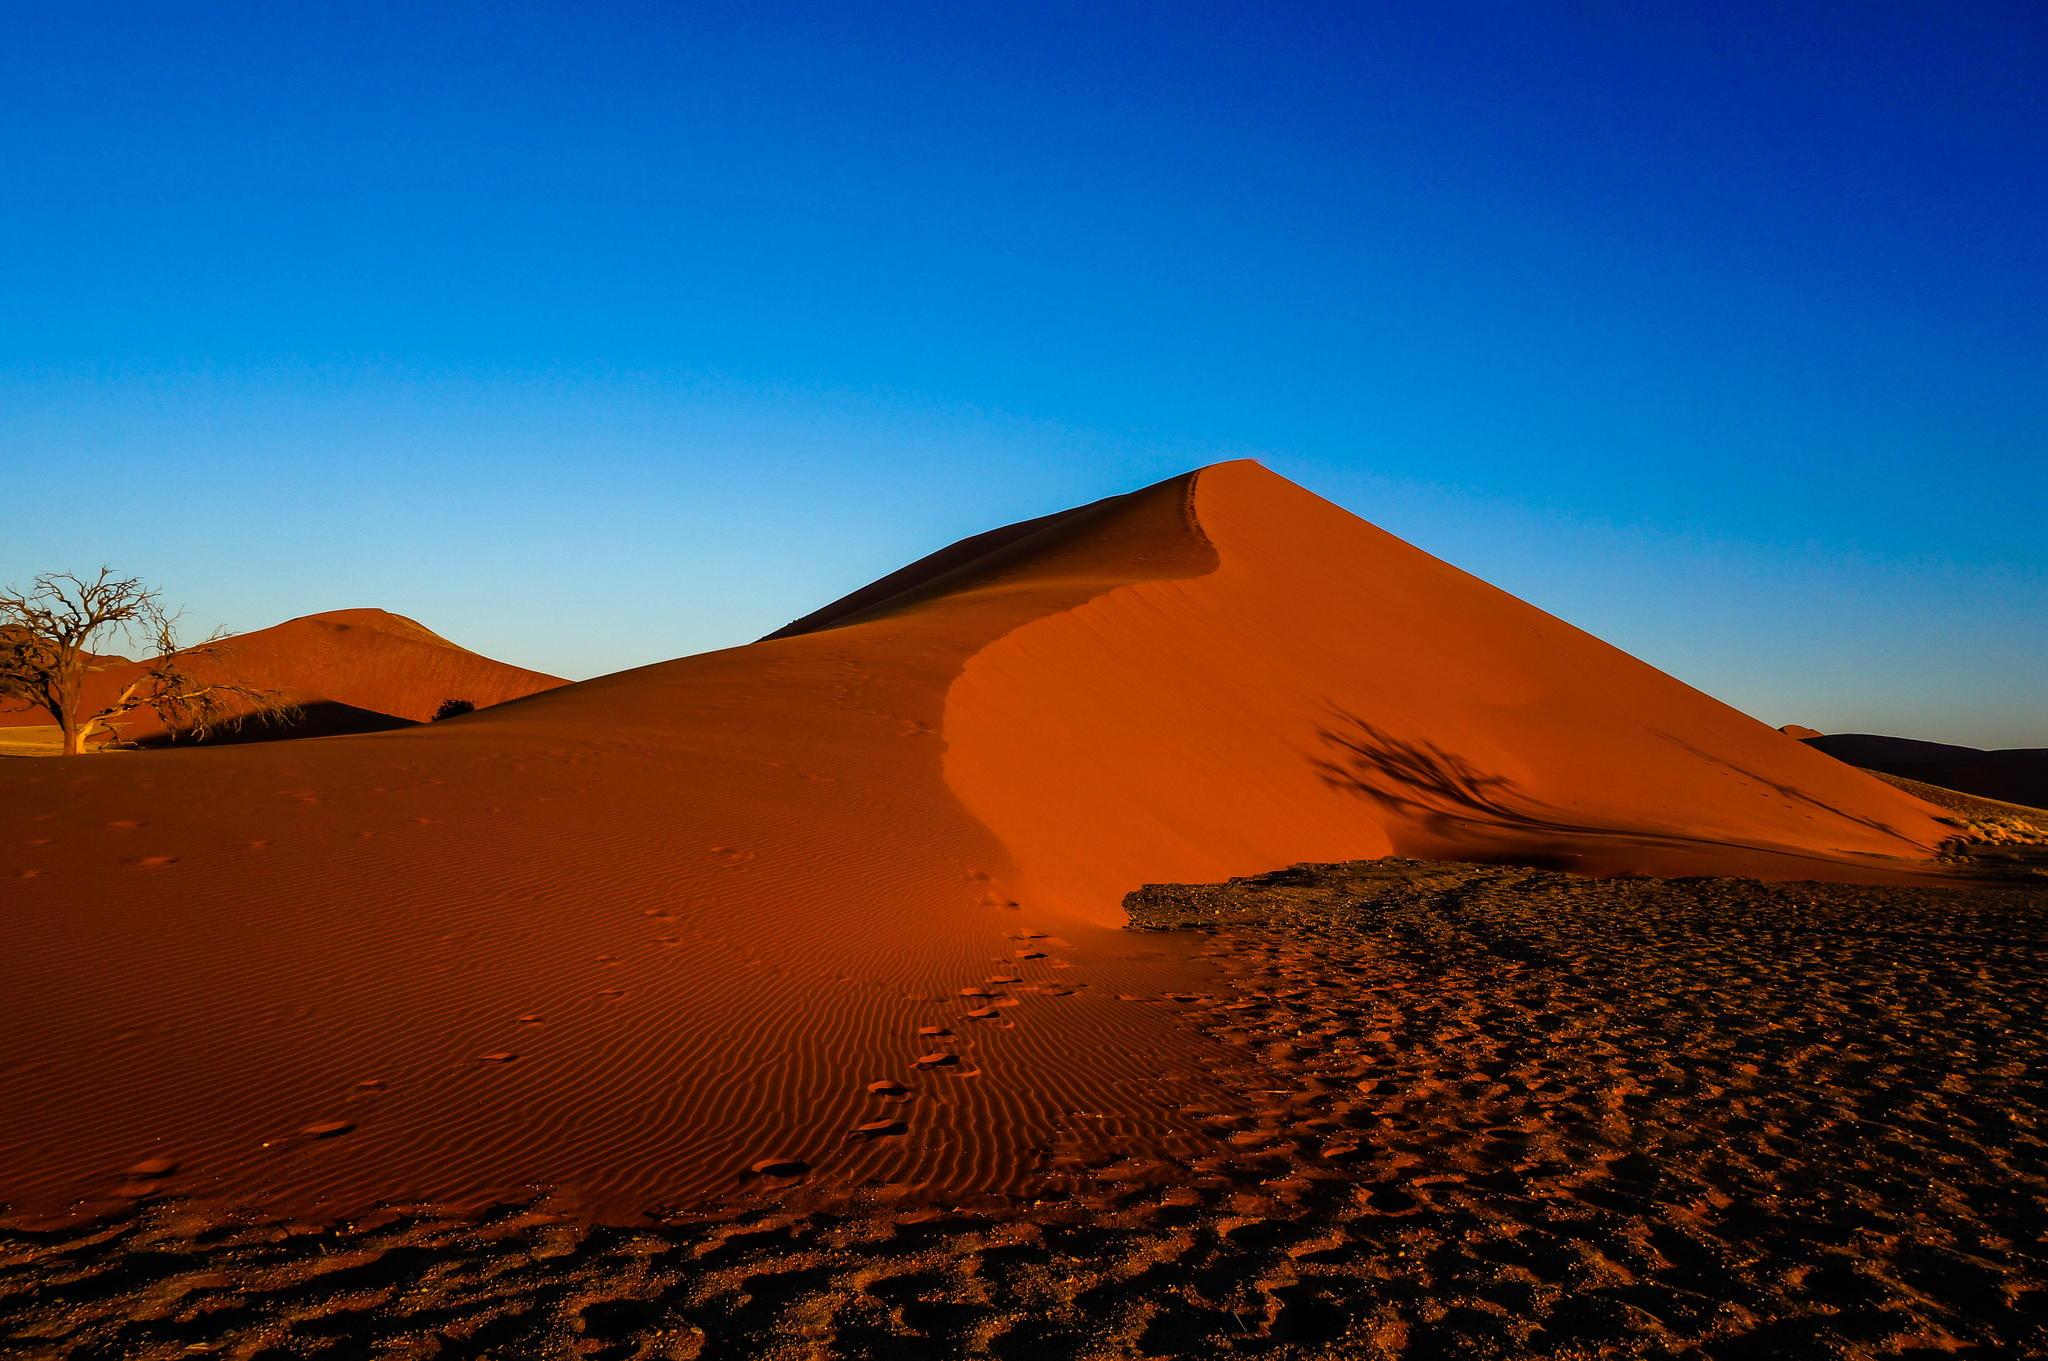 Namib Desert, Namibia by Akiko Miyazaki